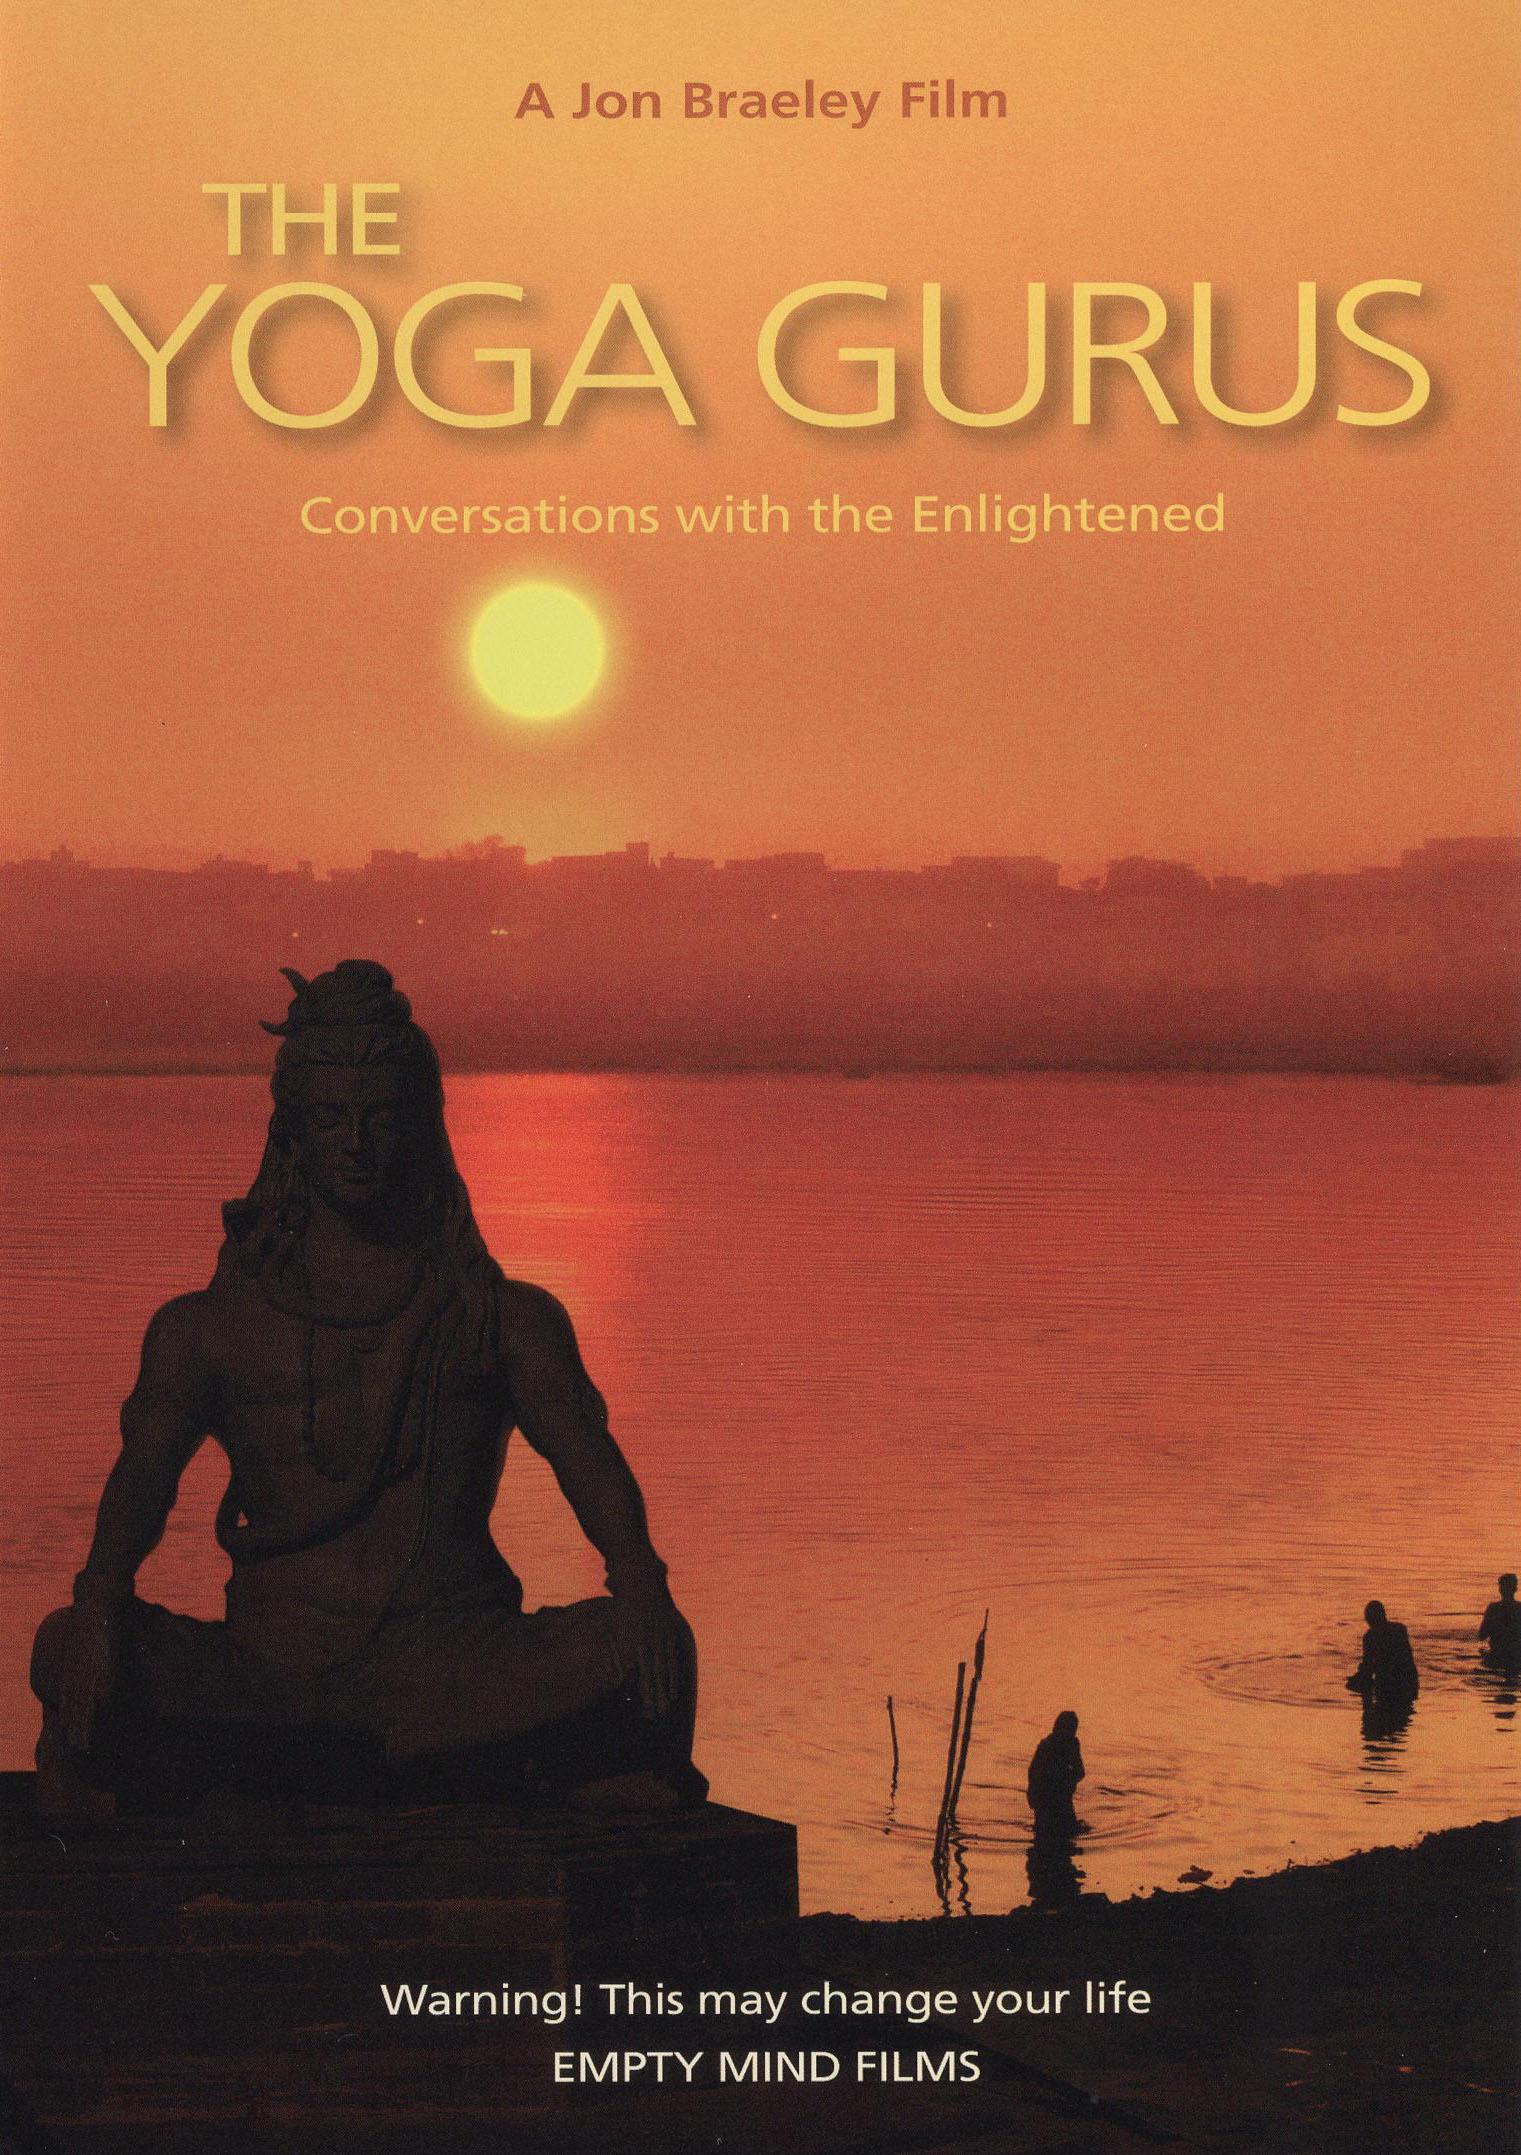 The Yoga Gurus (2009)